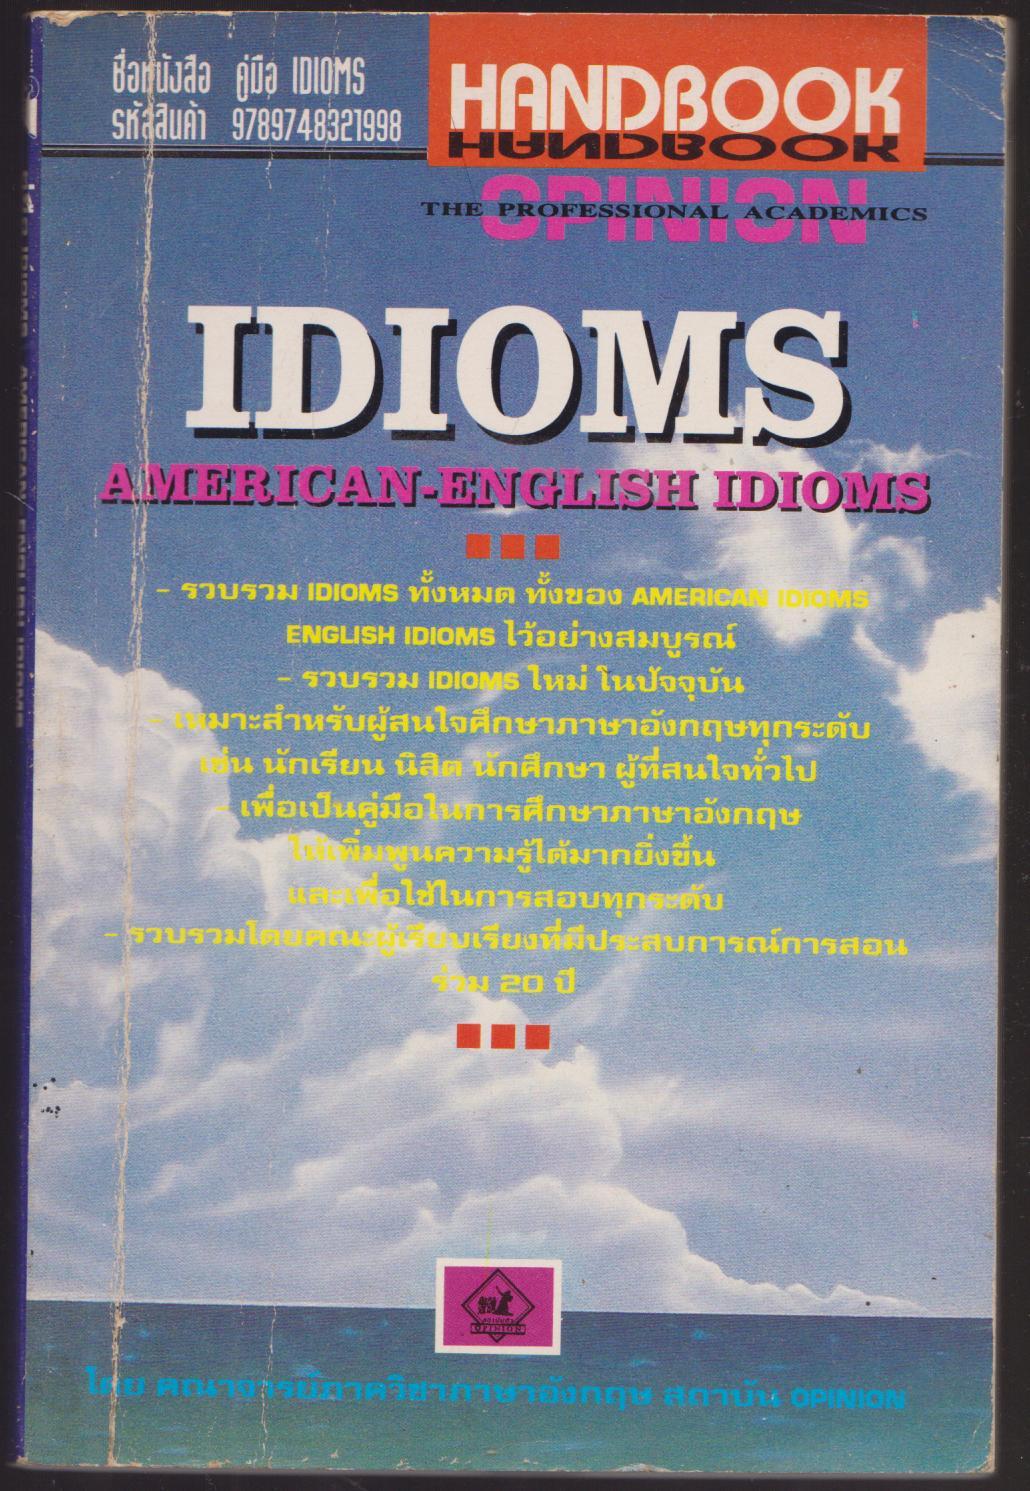 IDIOMS AMERICAN - ENGLISH IDIOMS